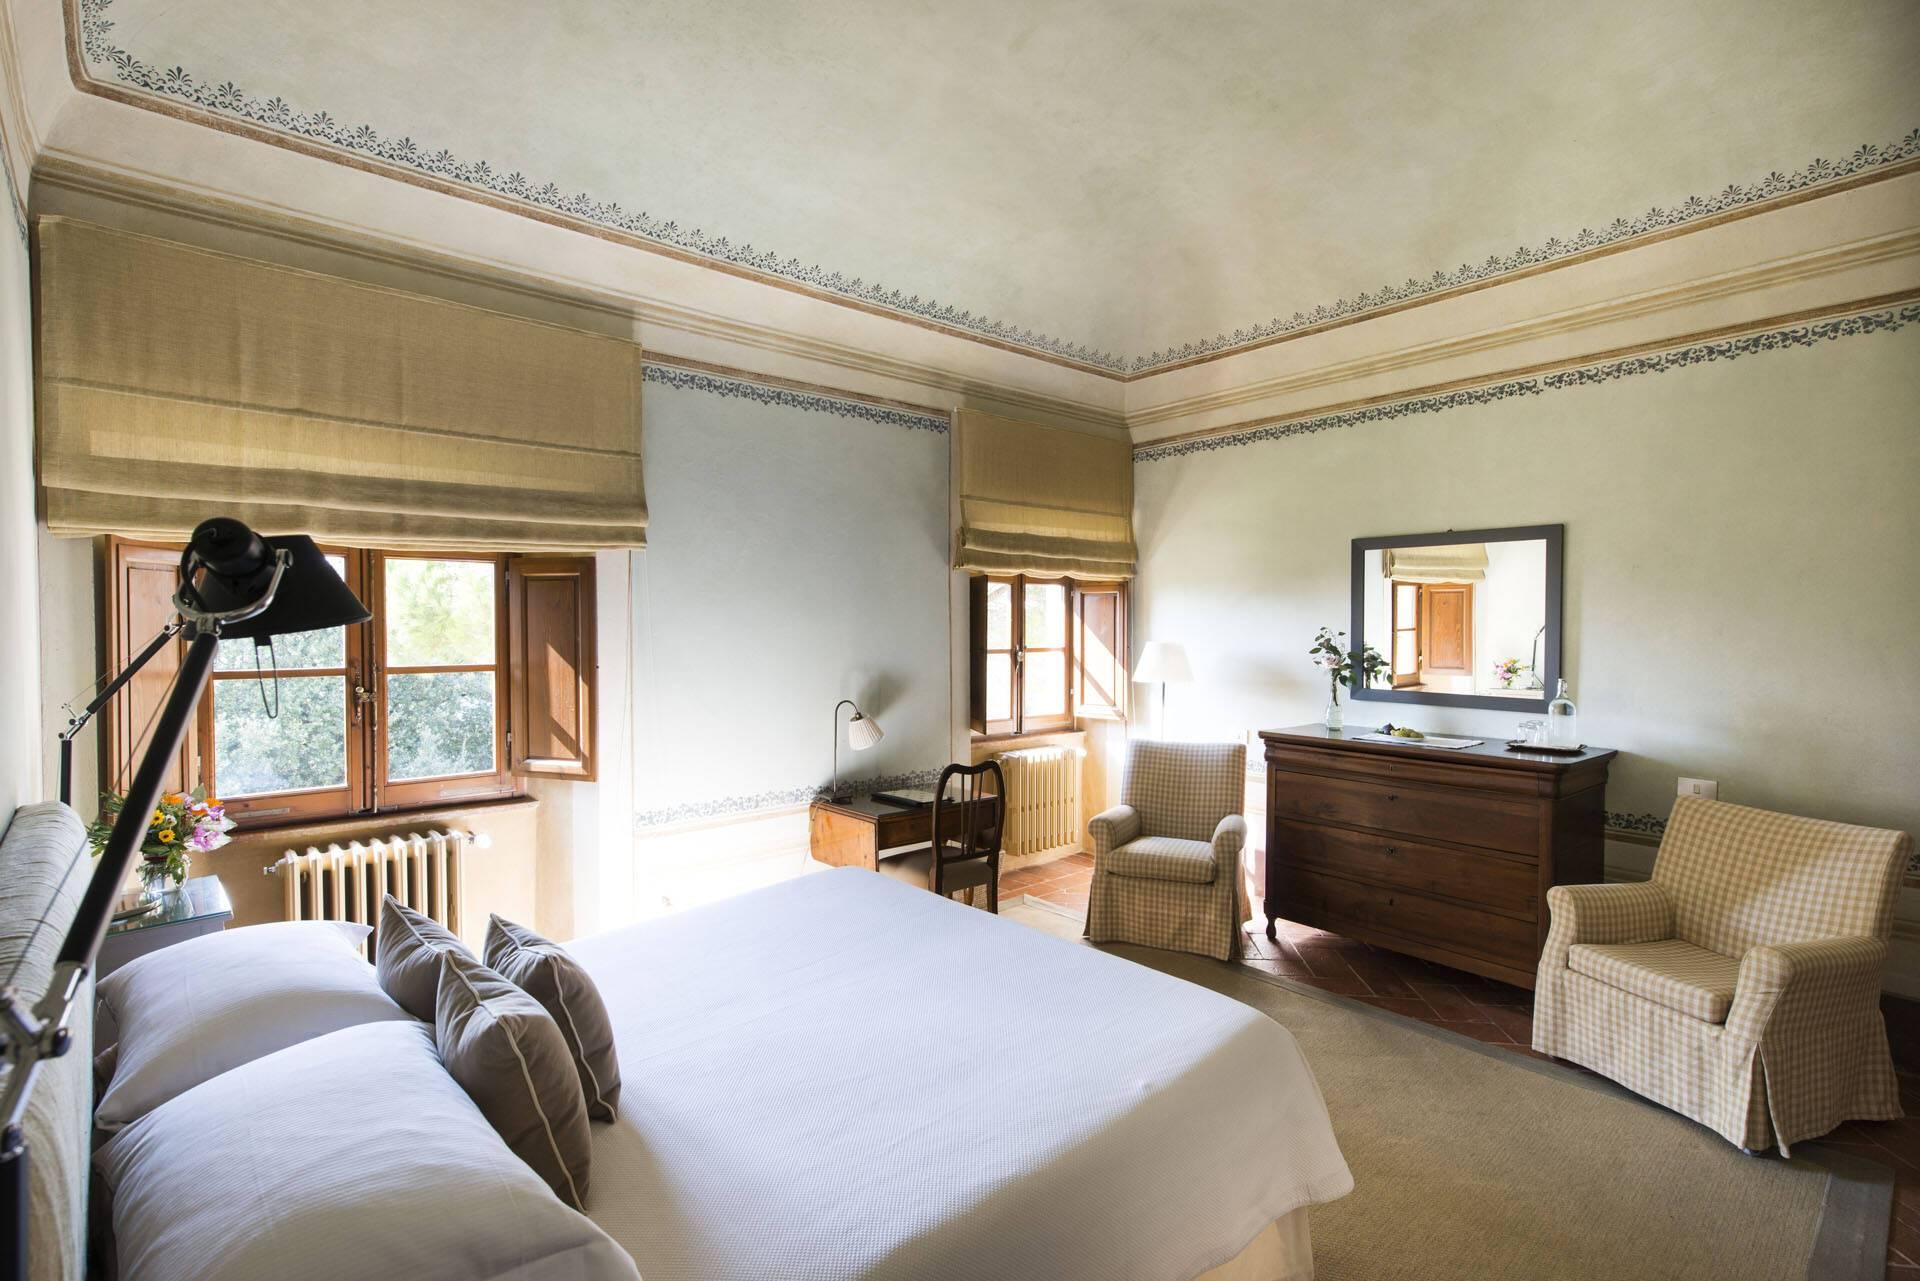 Borgo Pignano Toscane Villa Room with view